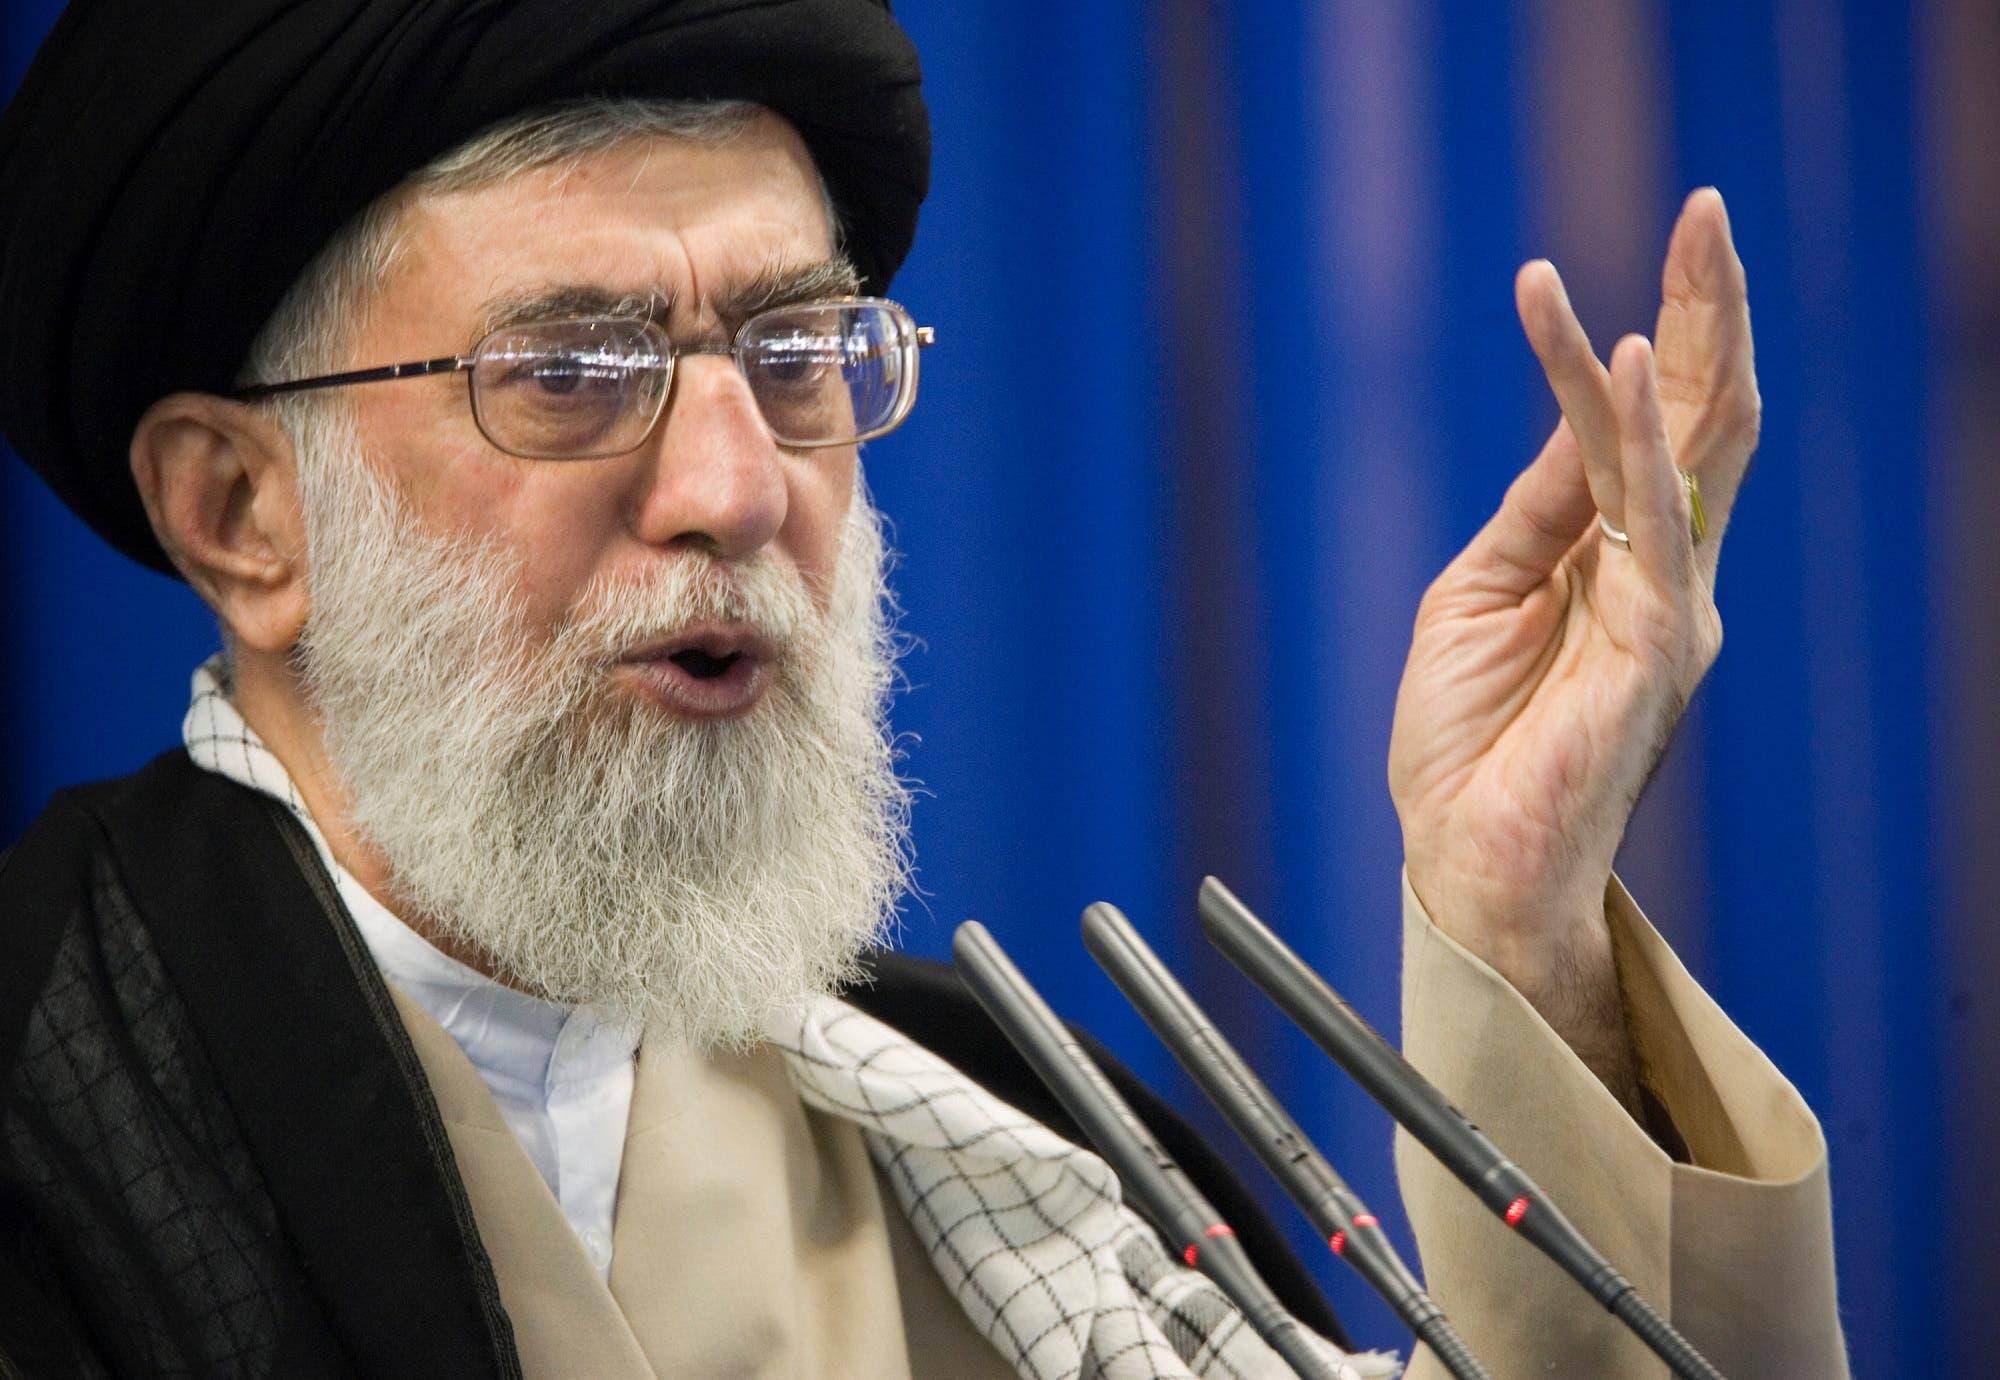 Supreme Leader Ayatollah Ali Khamenei speaks during Friday prayers in Tehran September 14, 2007. (Reuters)